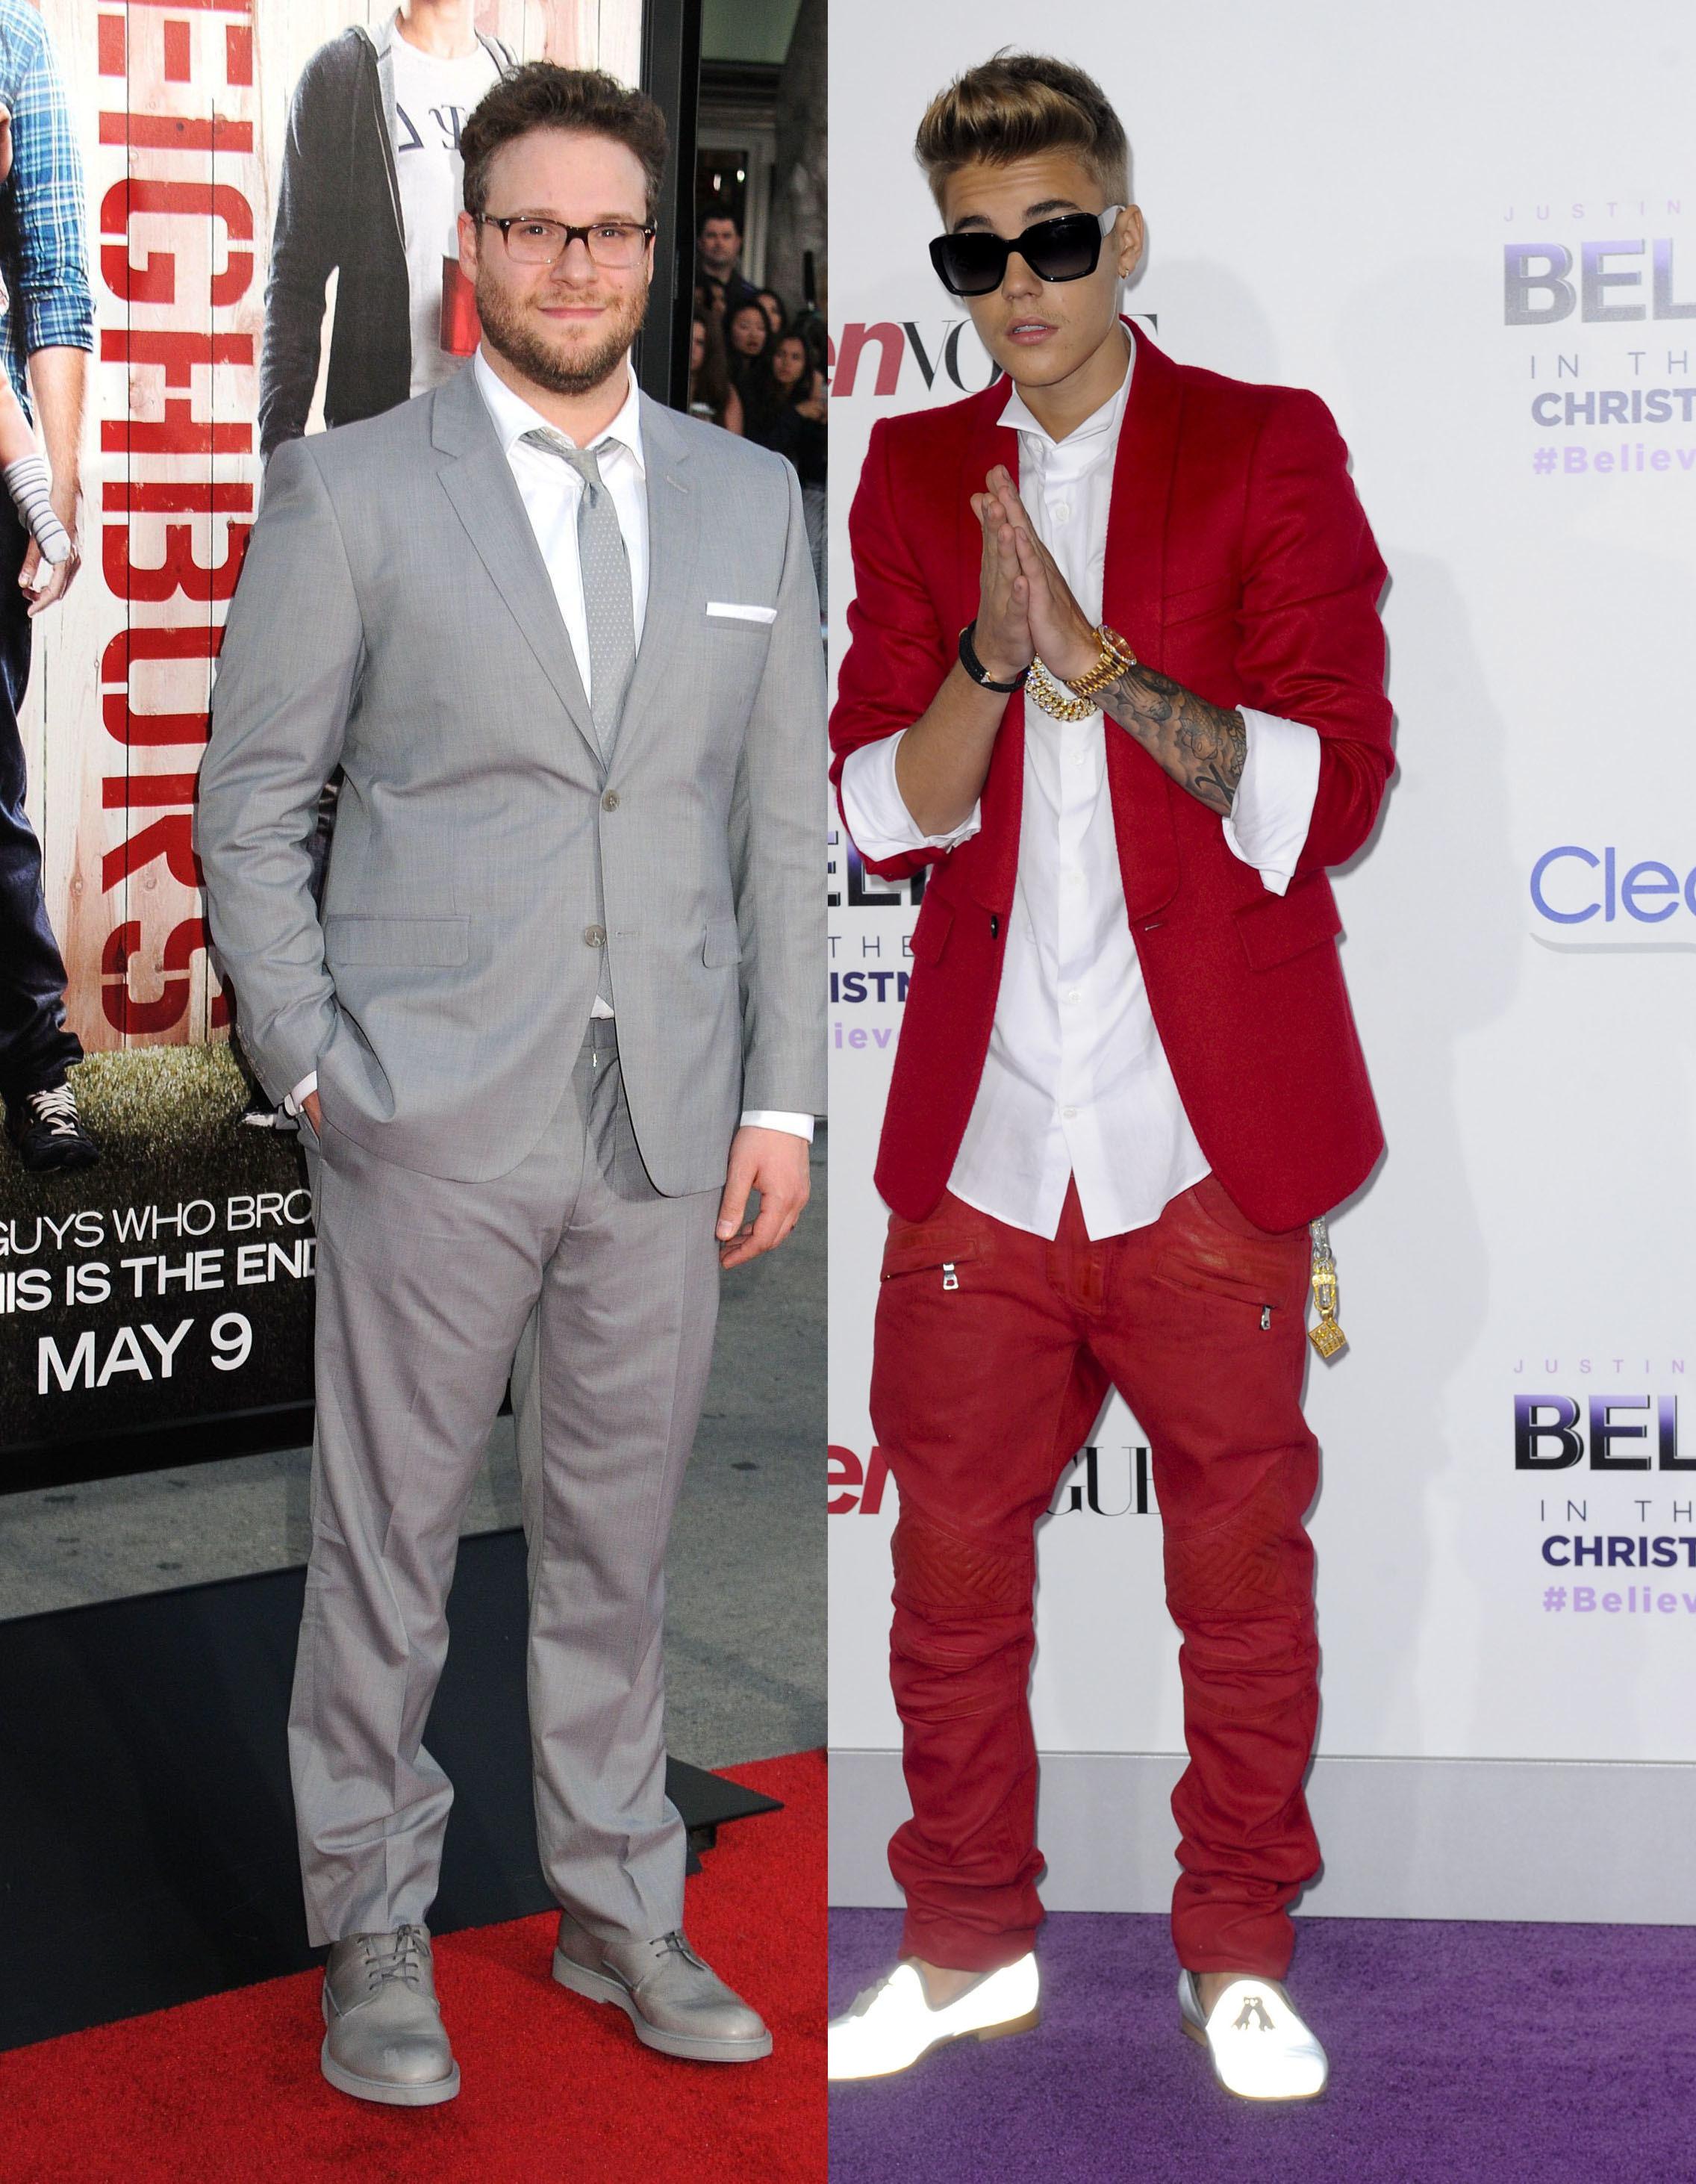 Justin Bieber vs Seth Rogen